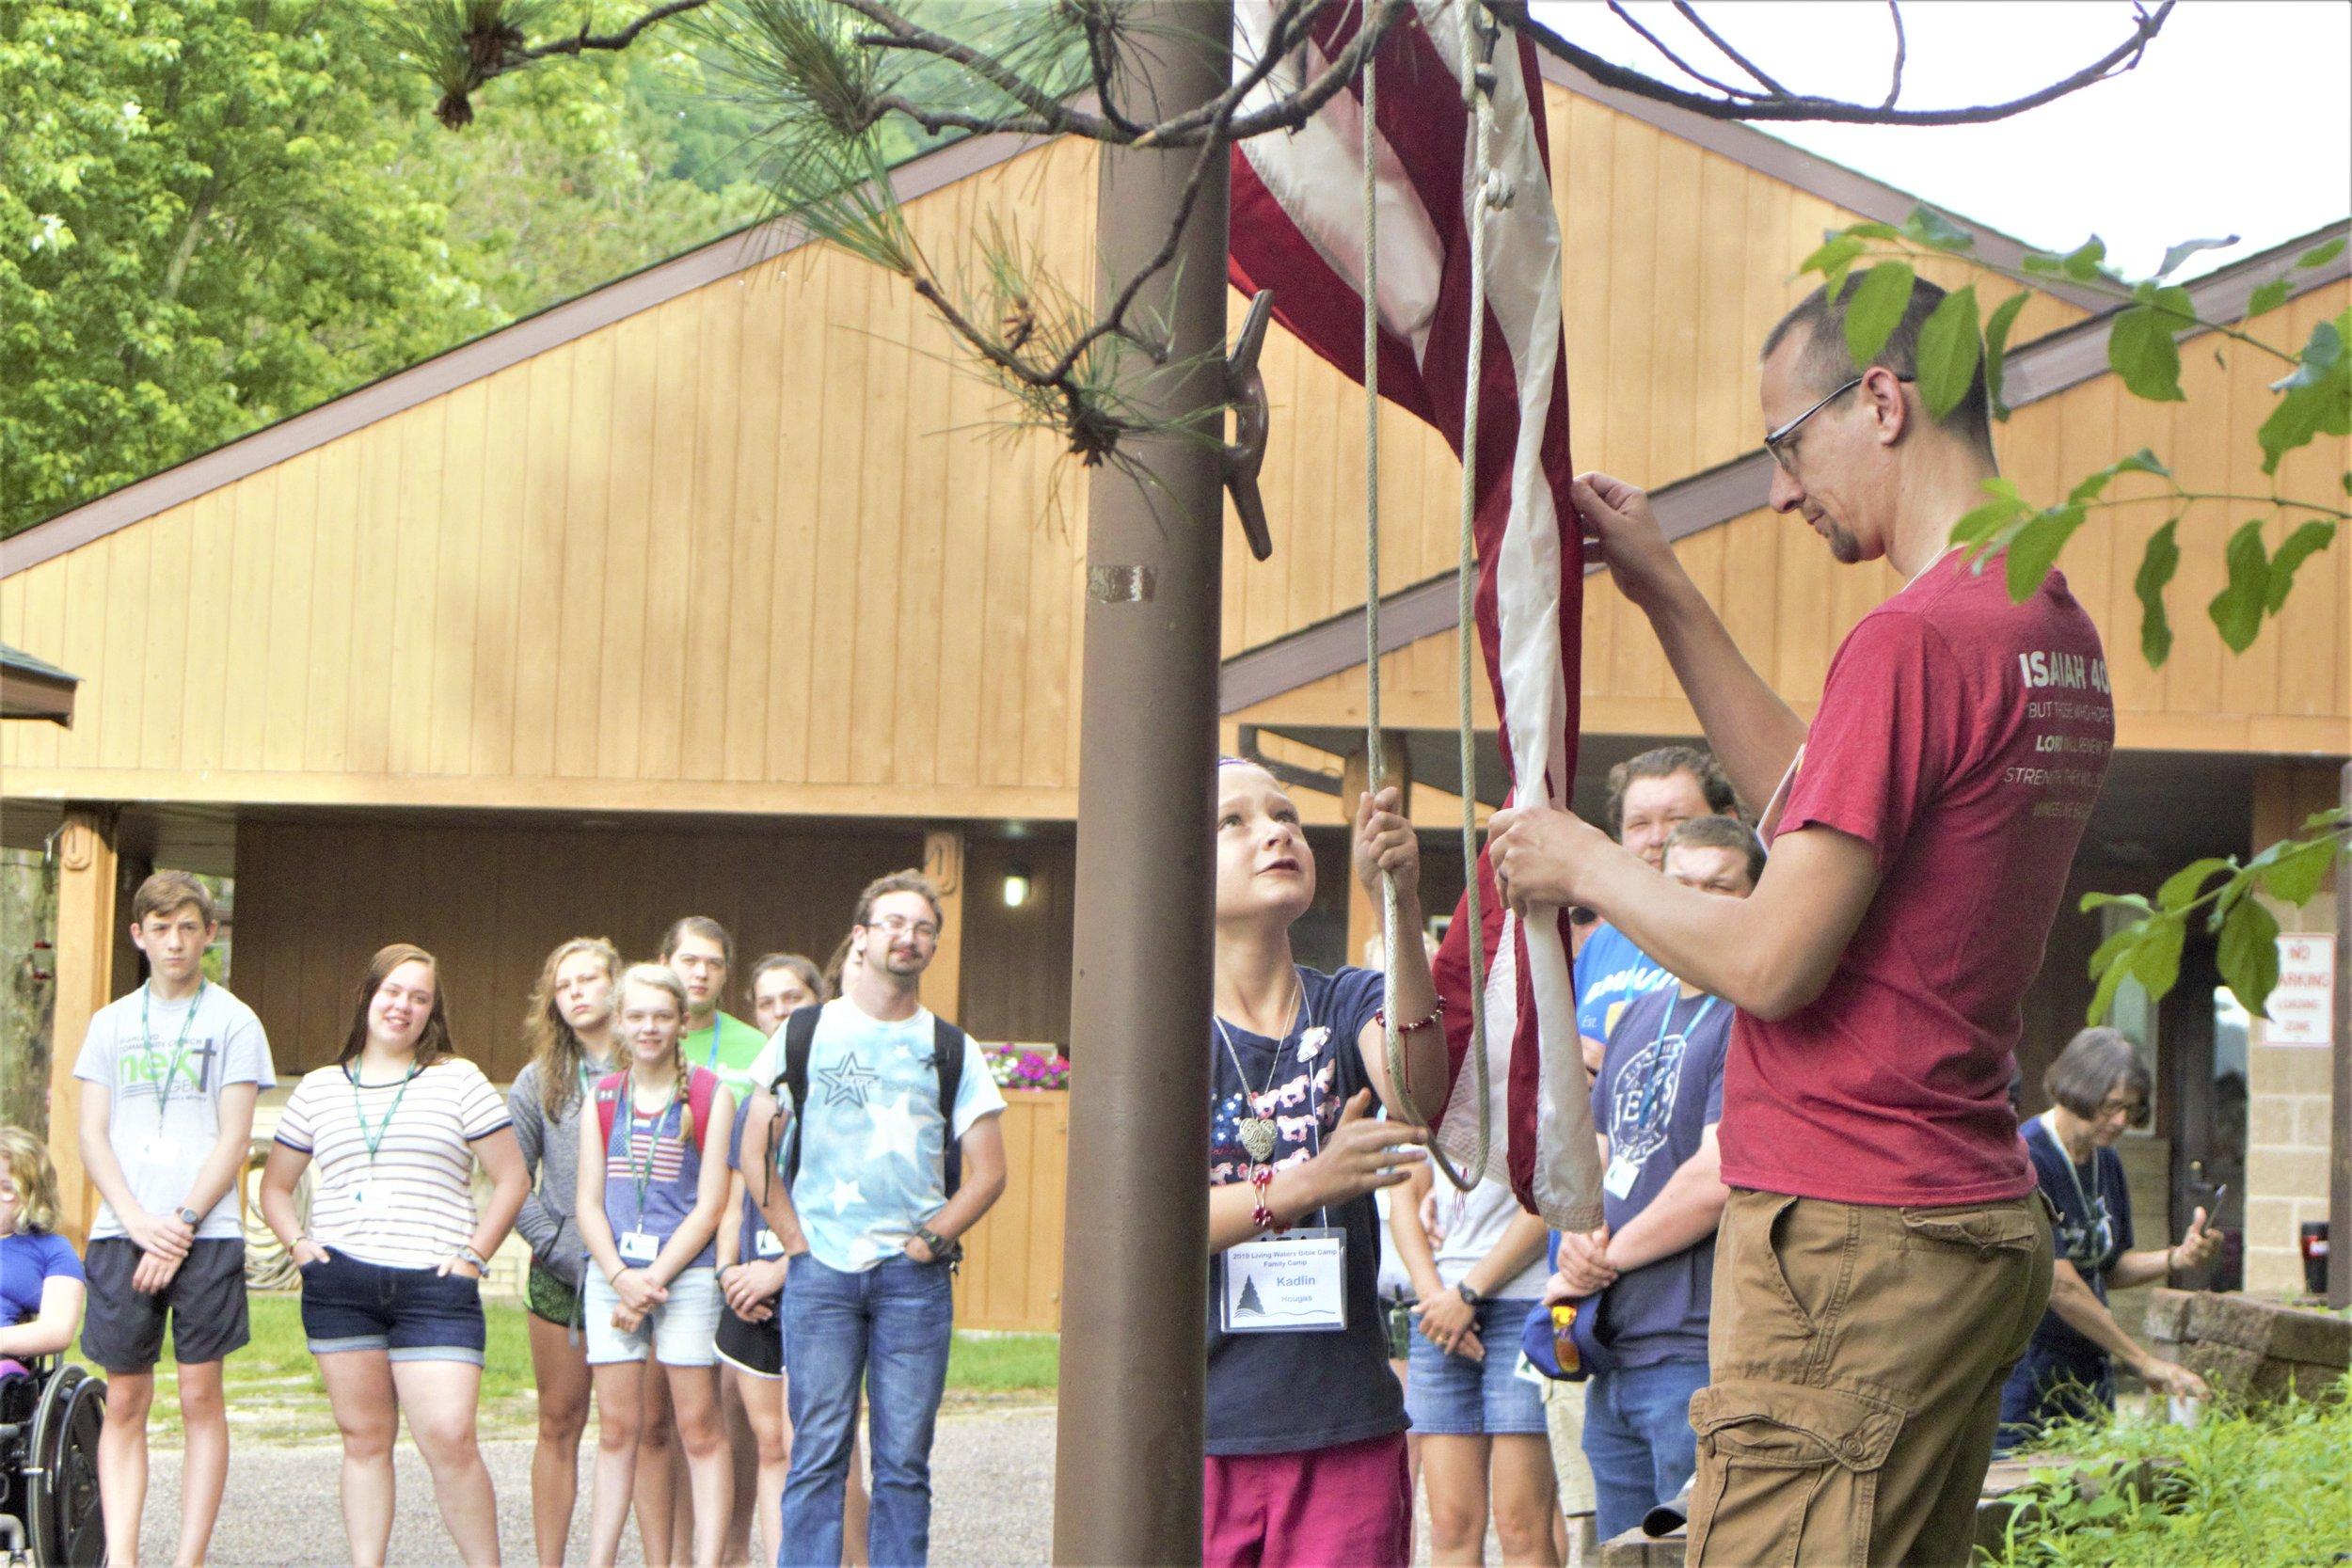 4th of July flag raising at Family Camp